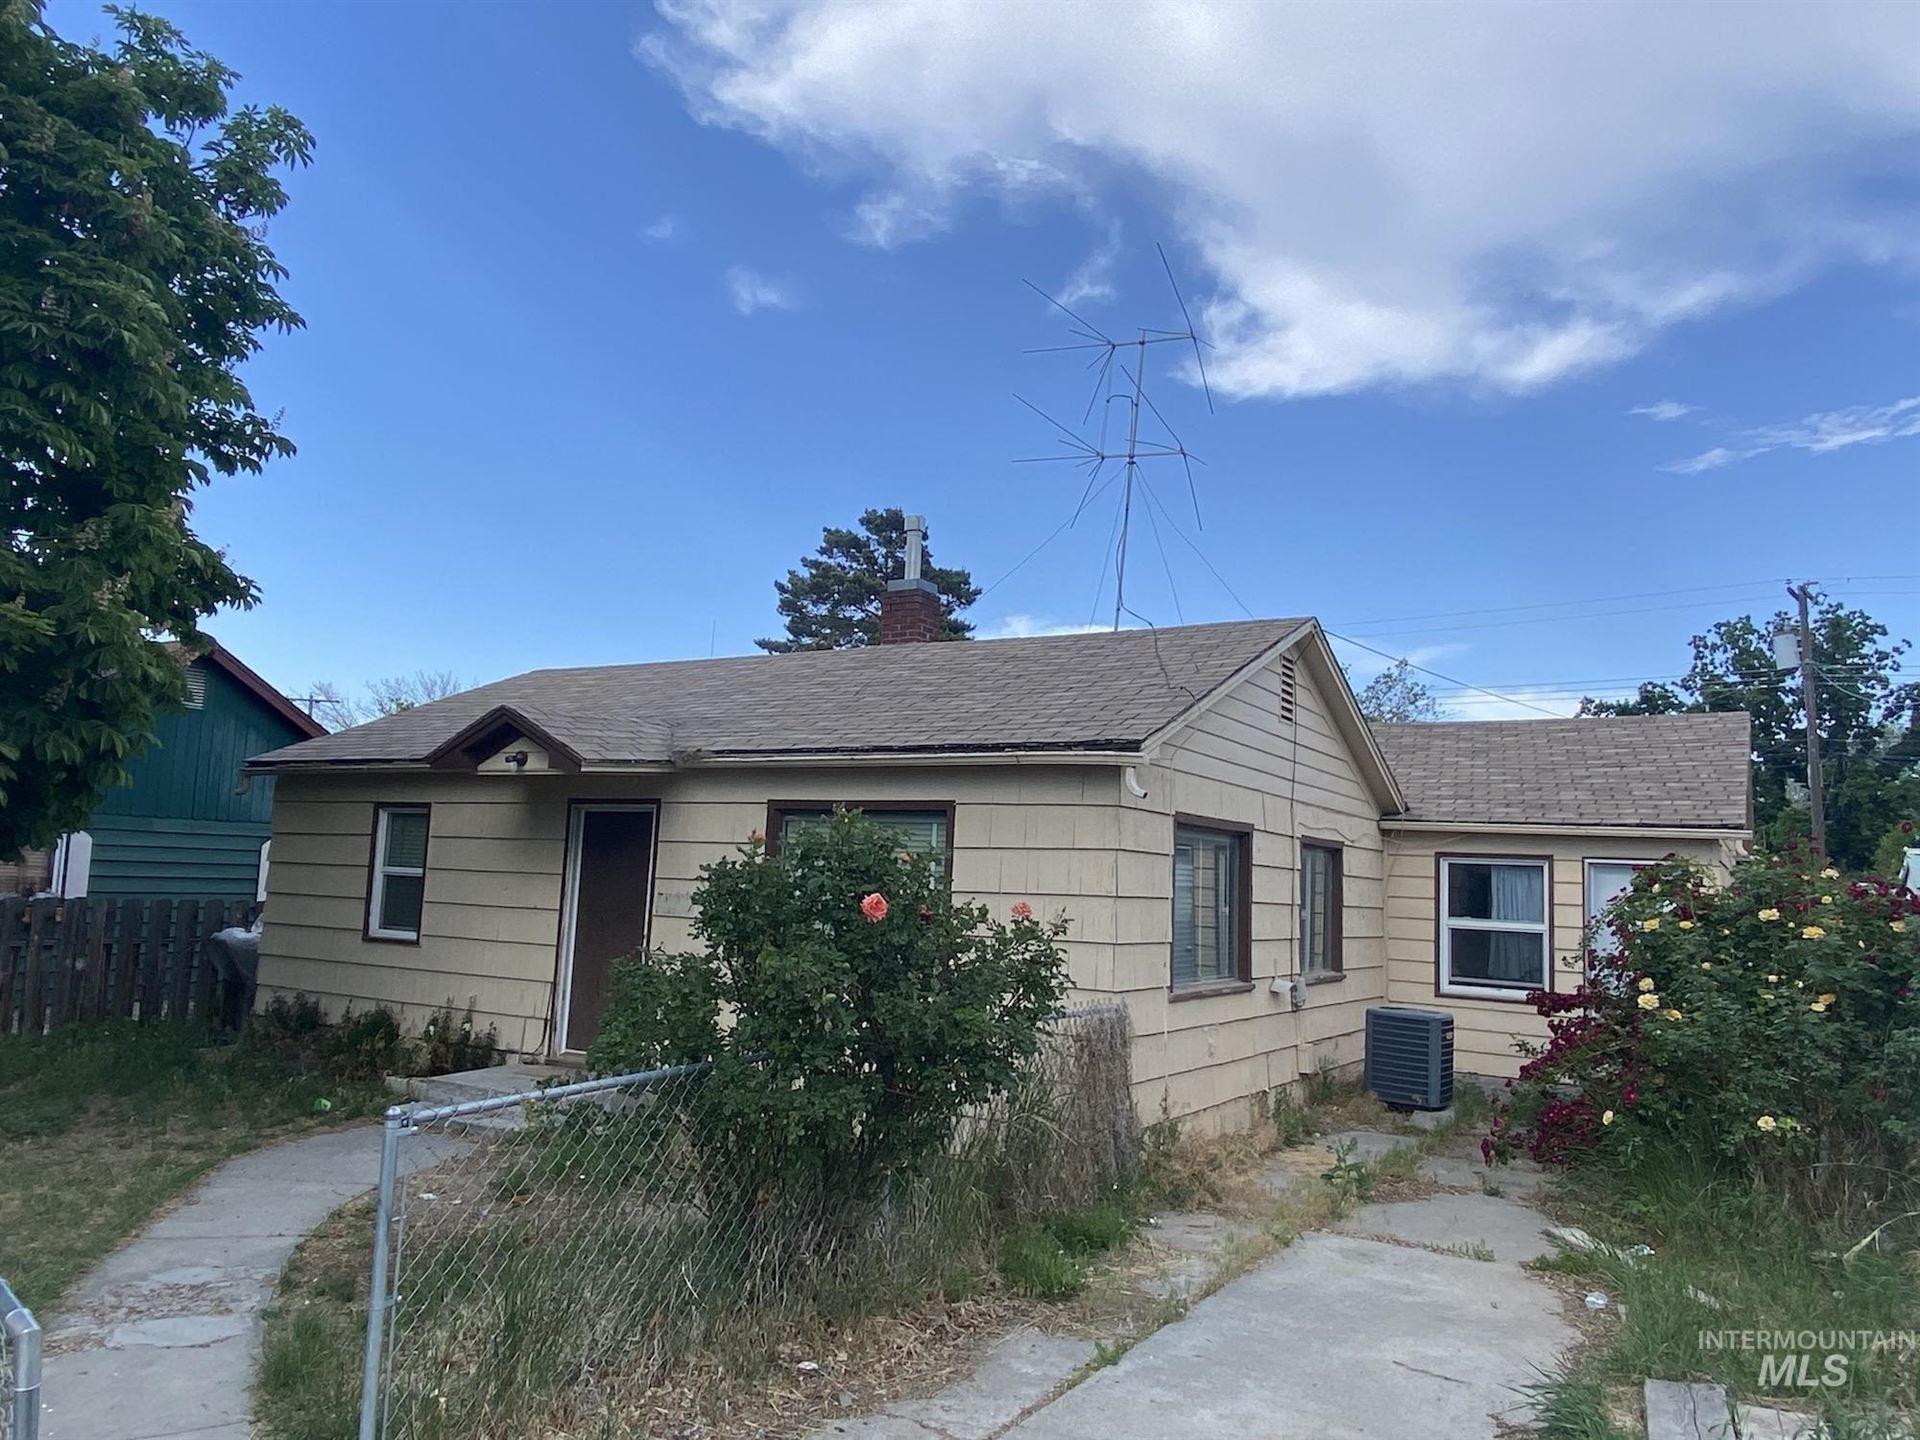 Photo of 816 N 9th Ave, Buhl, ID 83316 (MLS # 98806143)